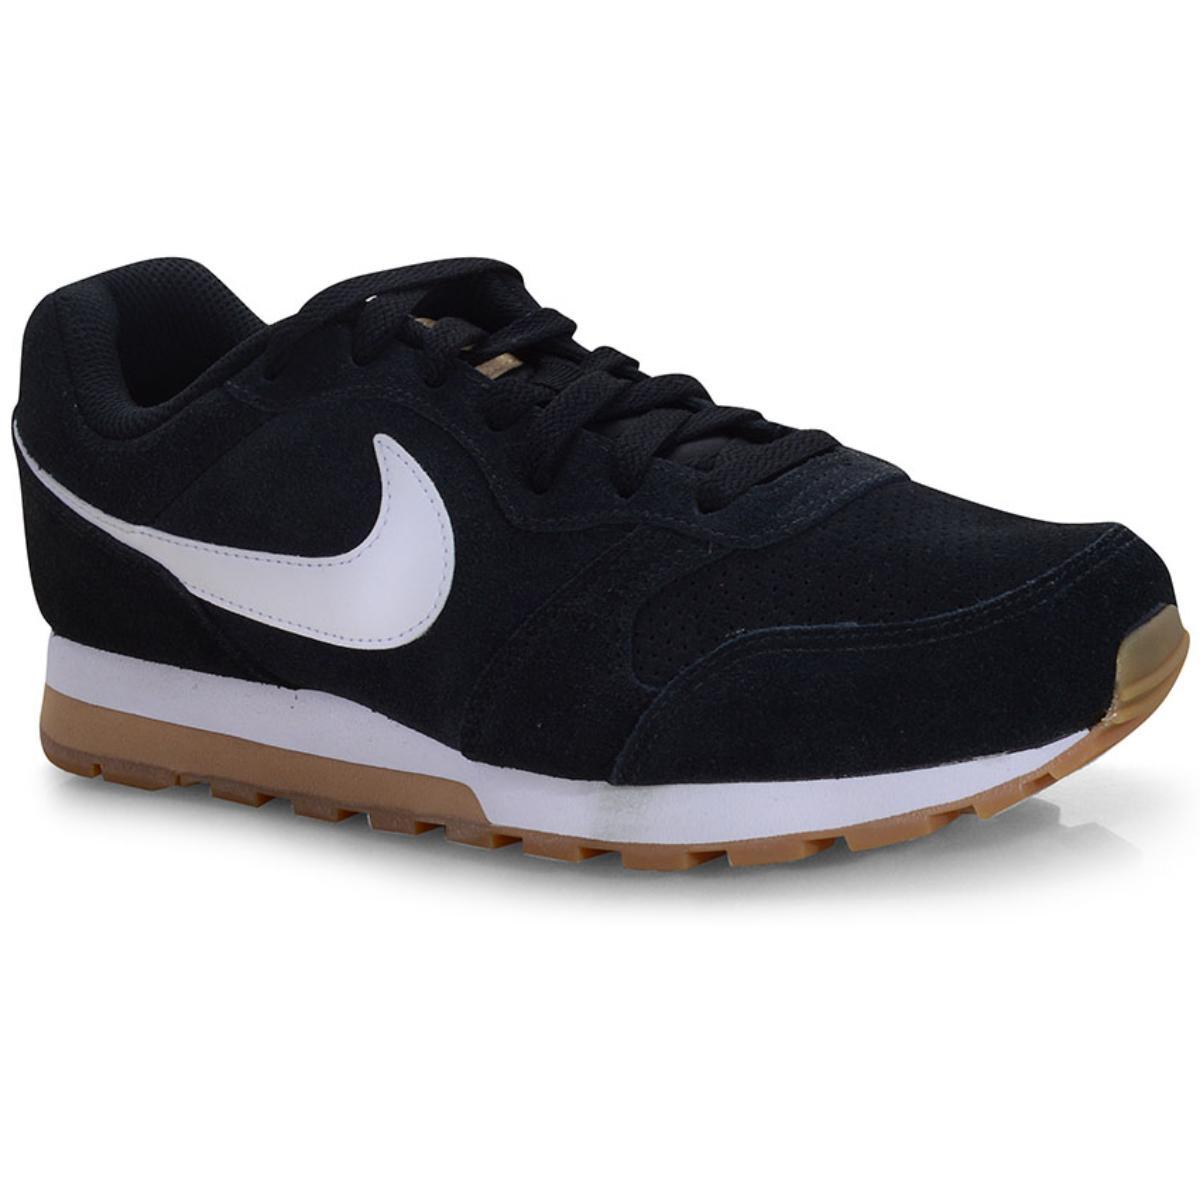 Tênis Masculino Nike Aq9211-001 md Runner 2 Suede Preto/branco